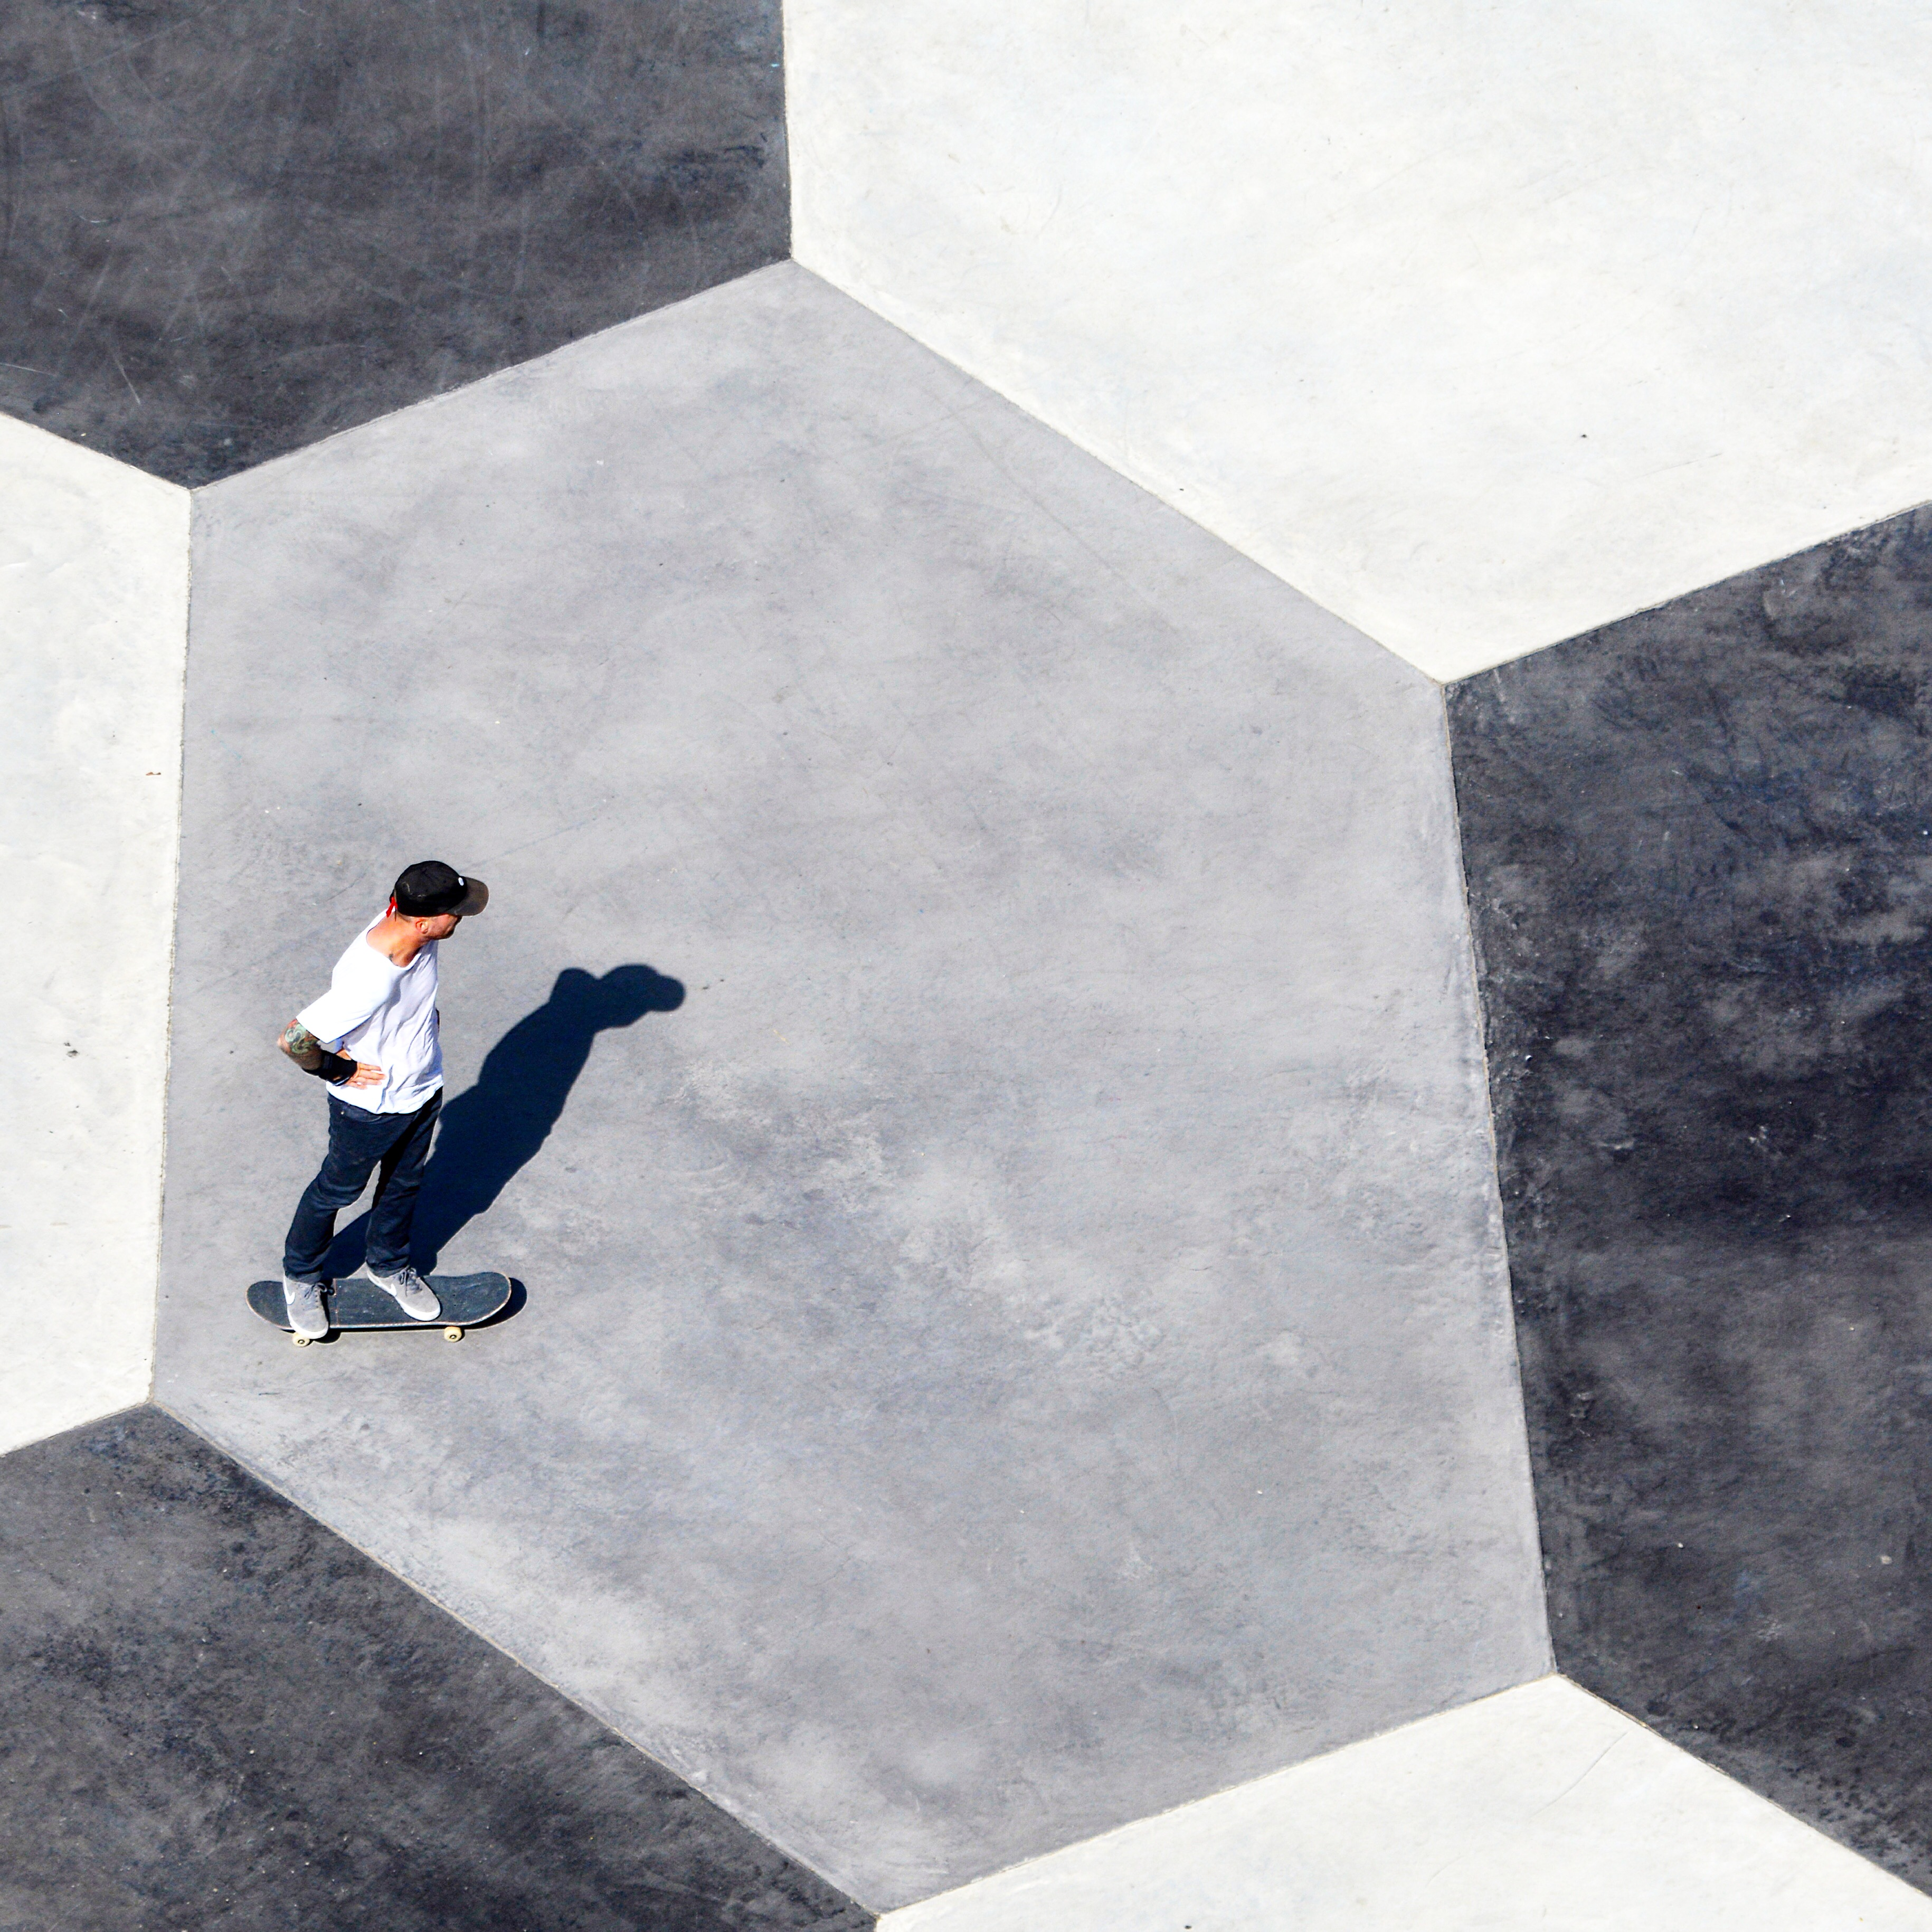 Skatepark_Petrusse_1